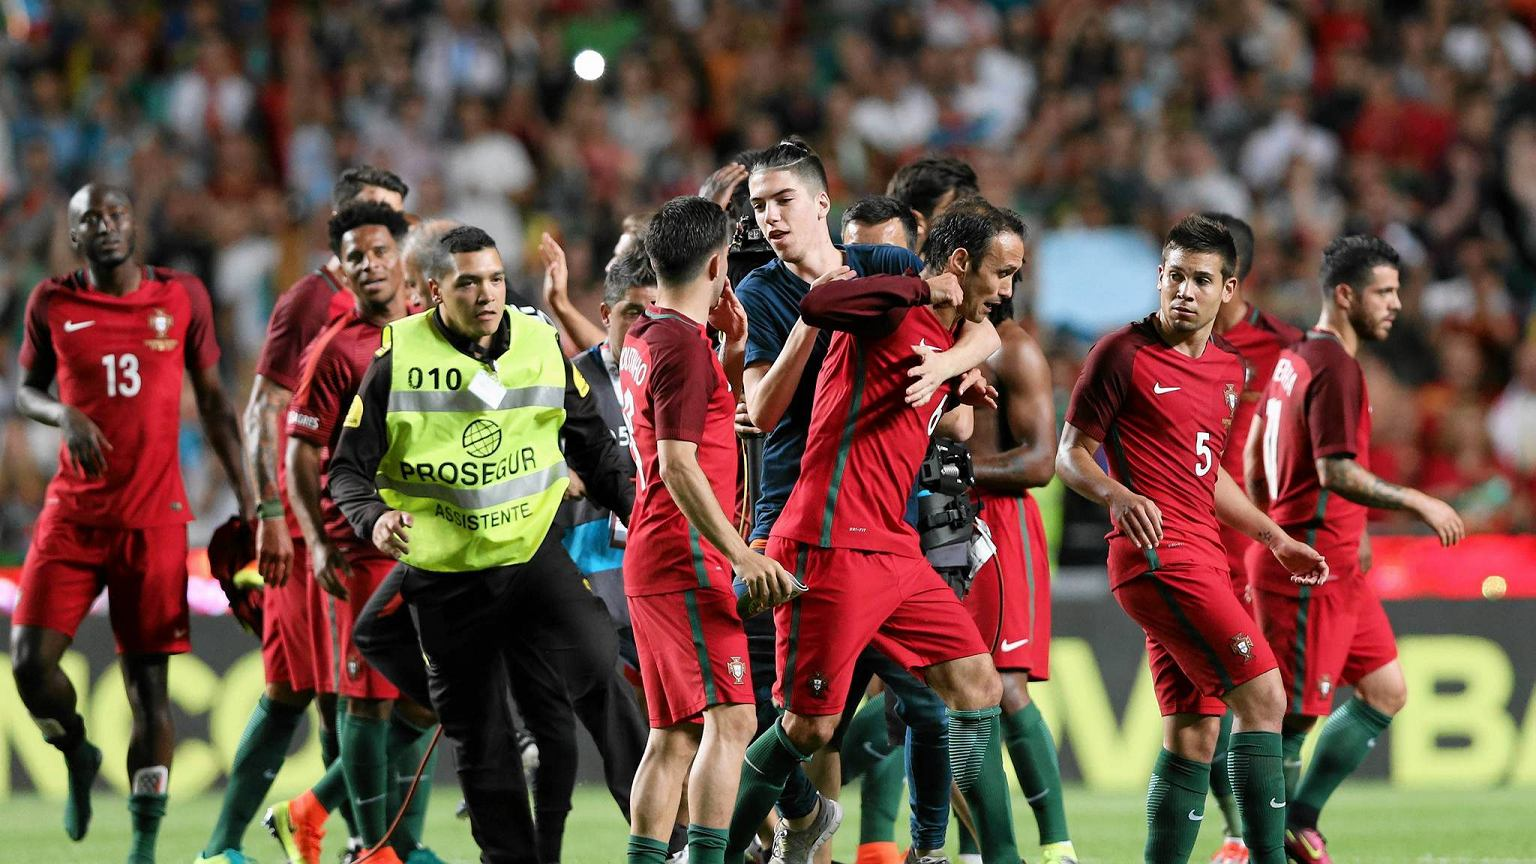 euro 2016 na ywo w tv mecz portugalia islandia gdzie. Black Bedroom Furniture Sets. Home Design Ideas